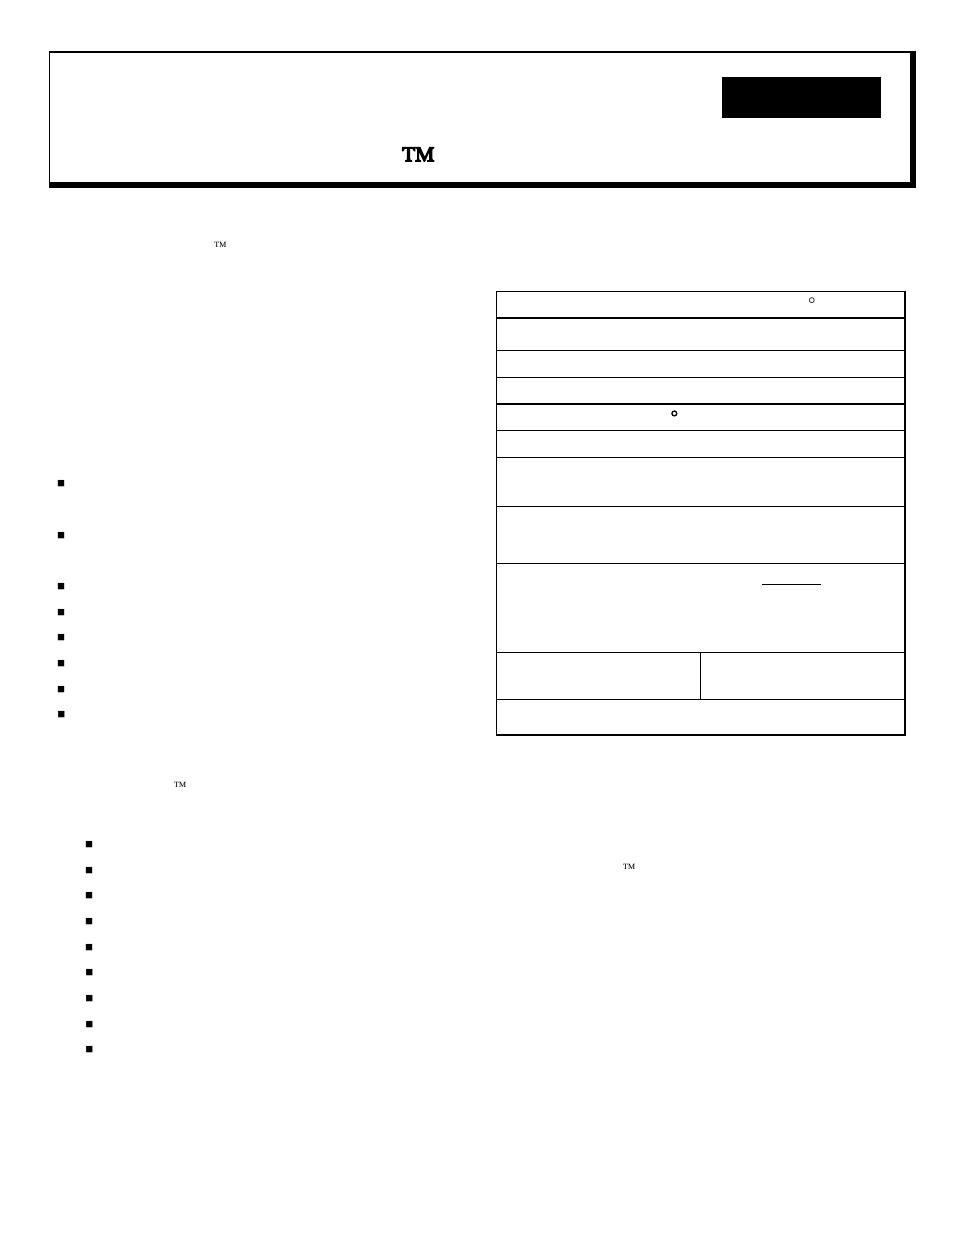 Chemtronics Pow-R-Wash NR ES1613 User Manual | 2 pages